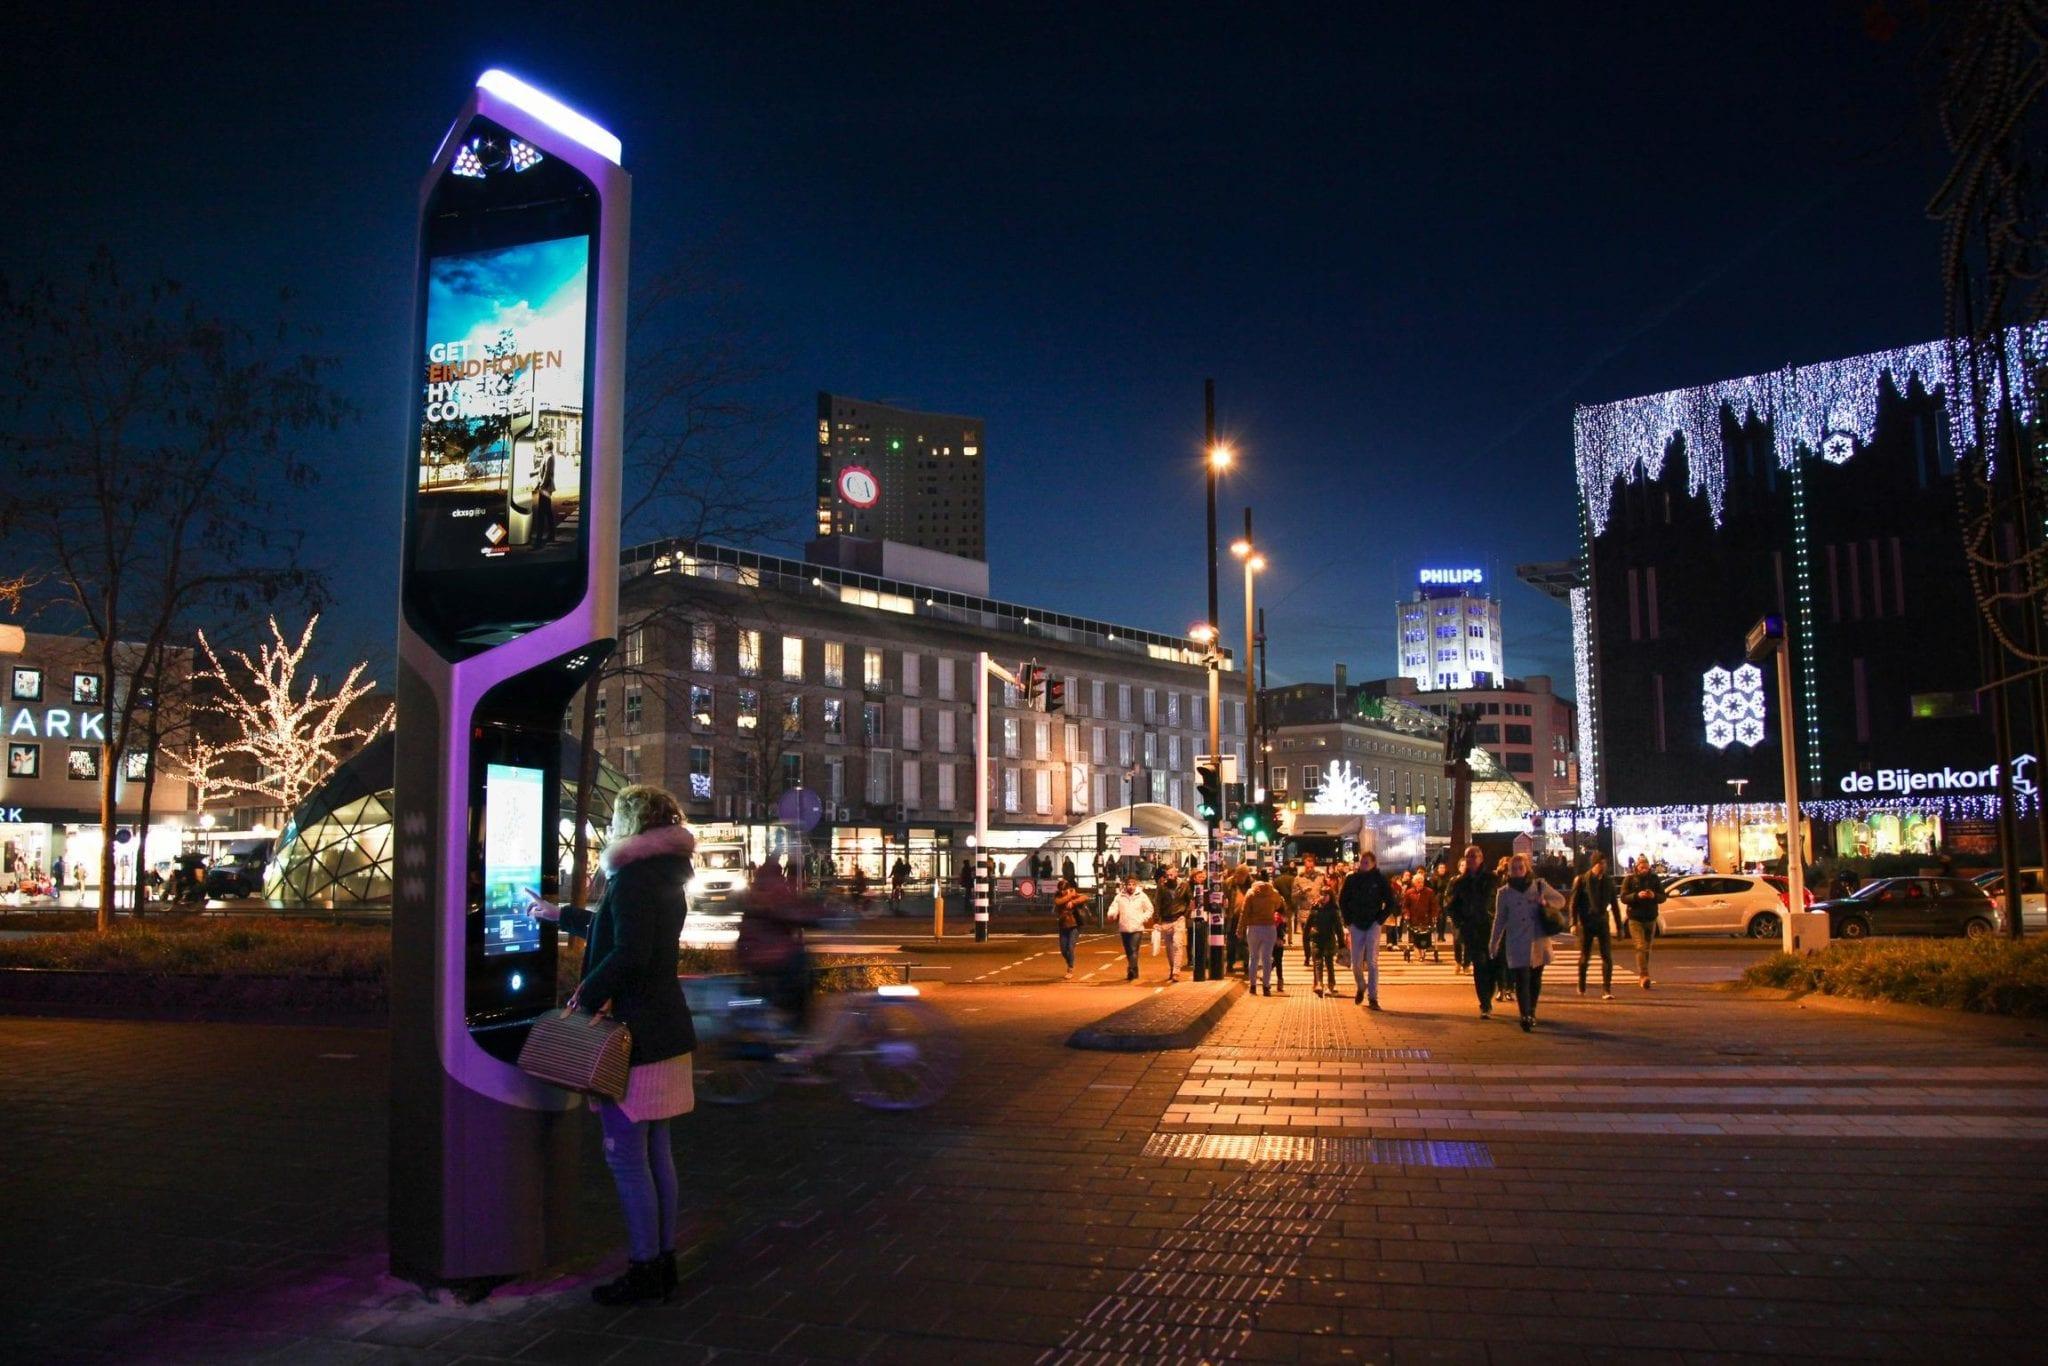 Zyntronic and Citybeacon interactive kiosk in Eindhoven